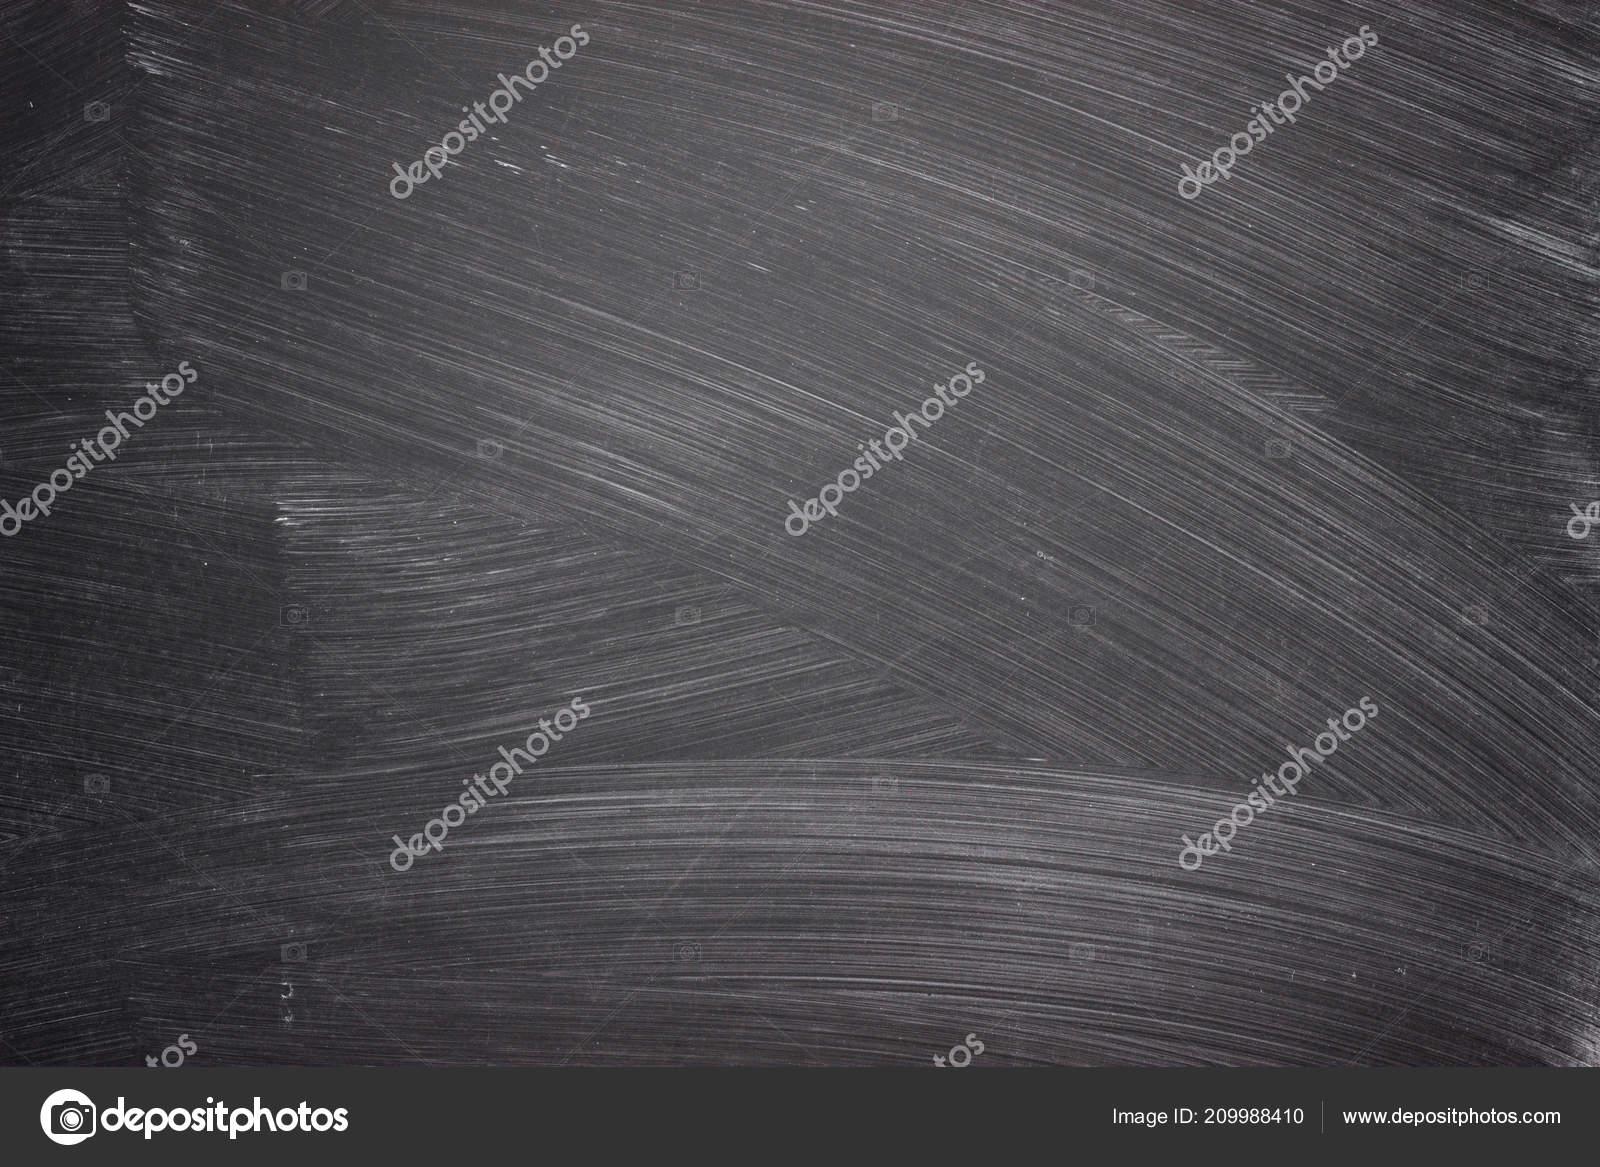 black chalkboard background texture blackboard with chalk trace